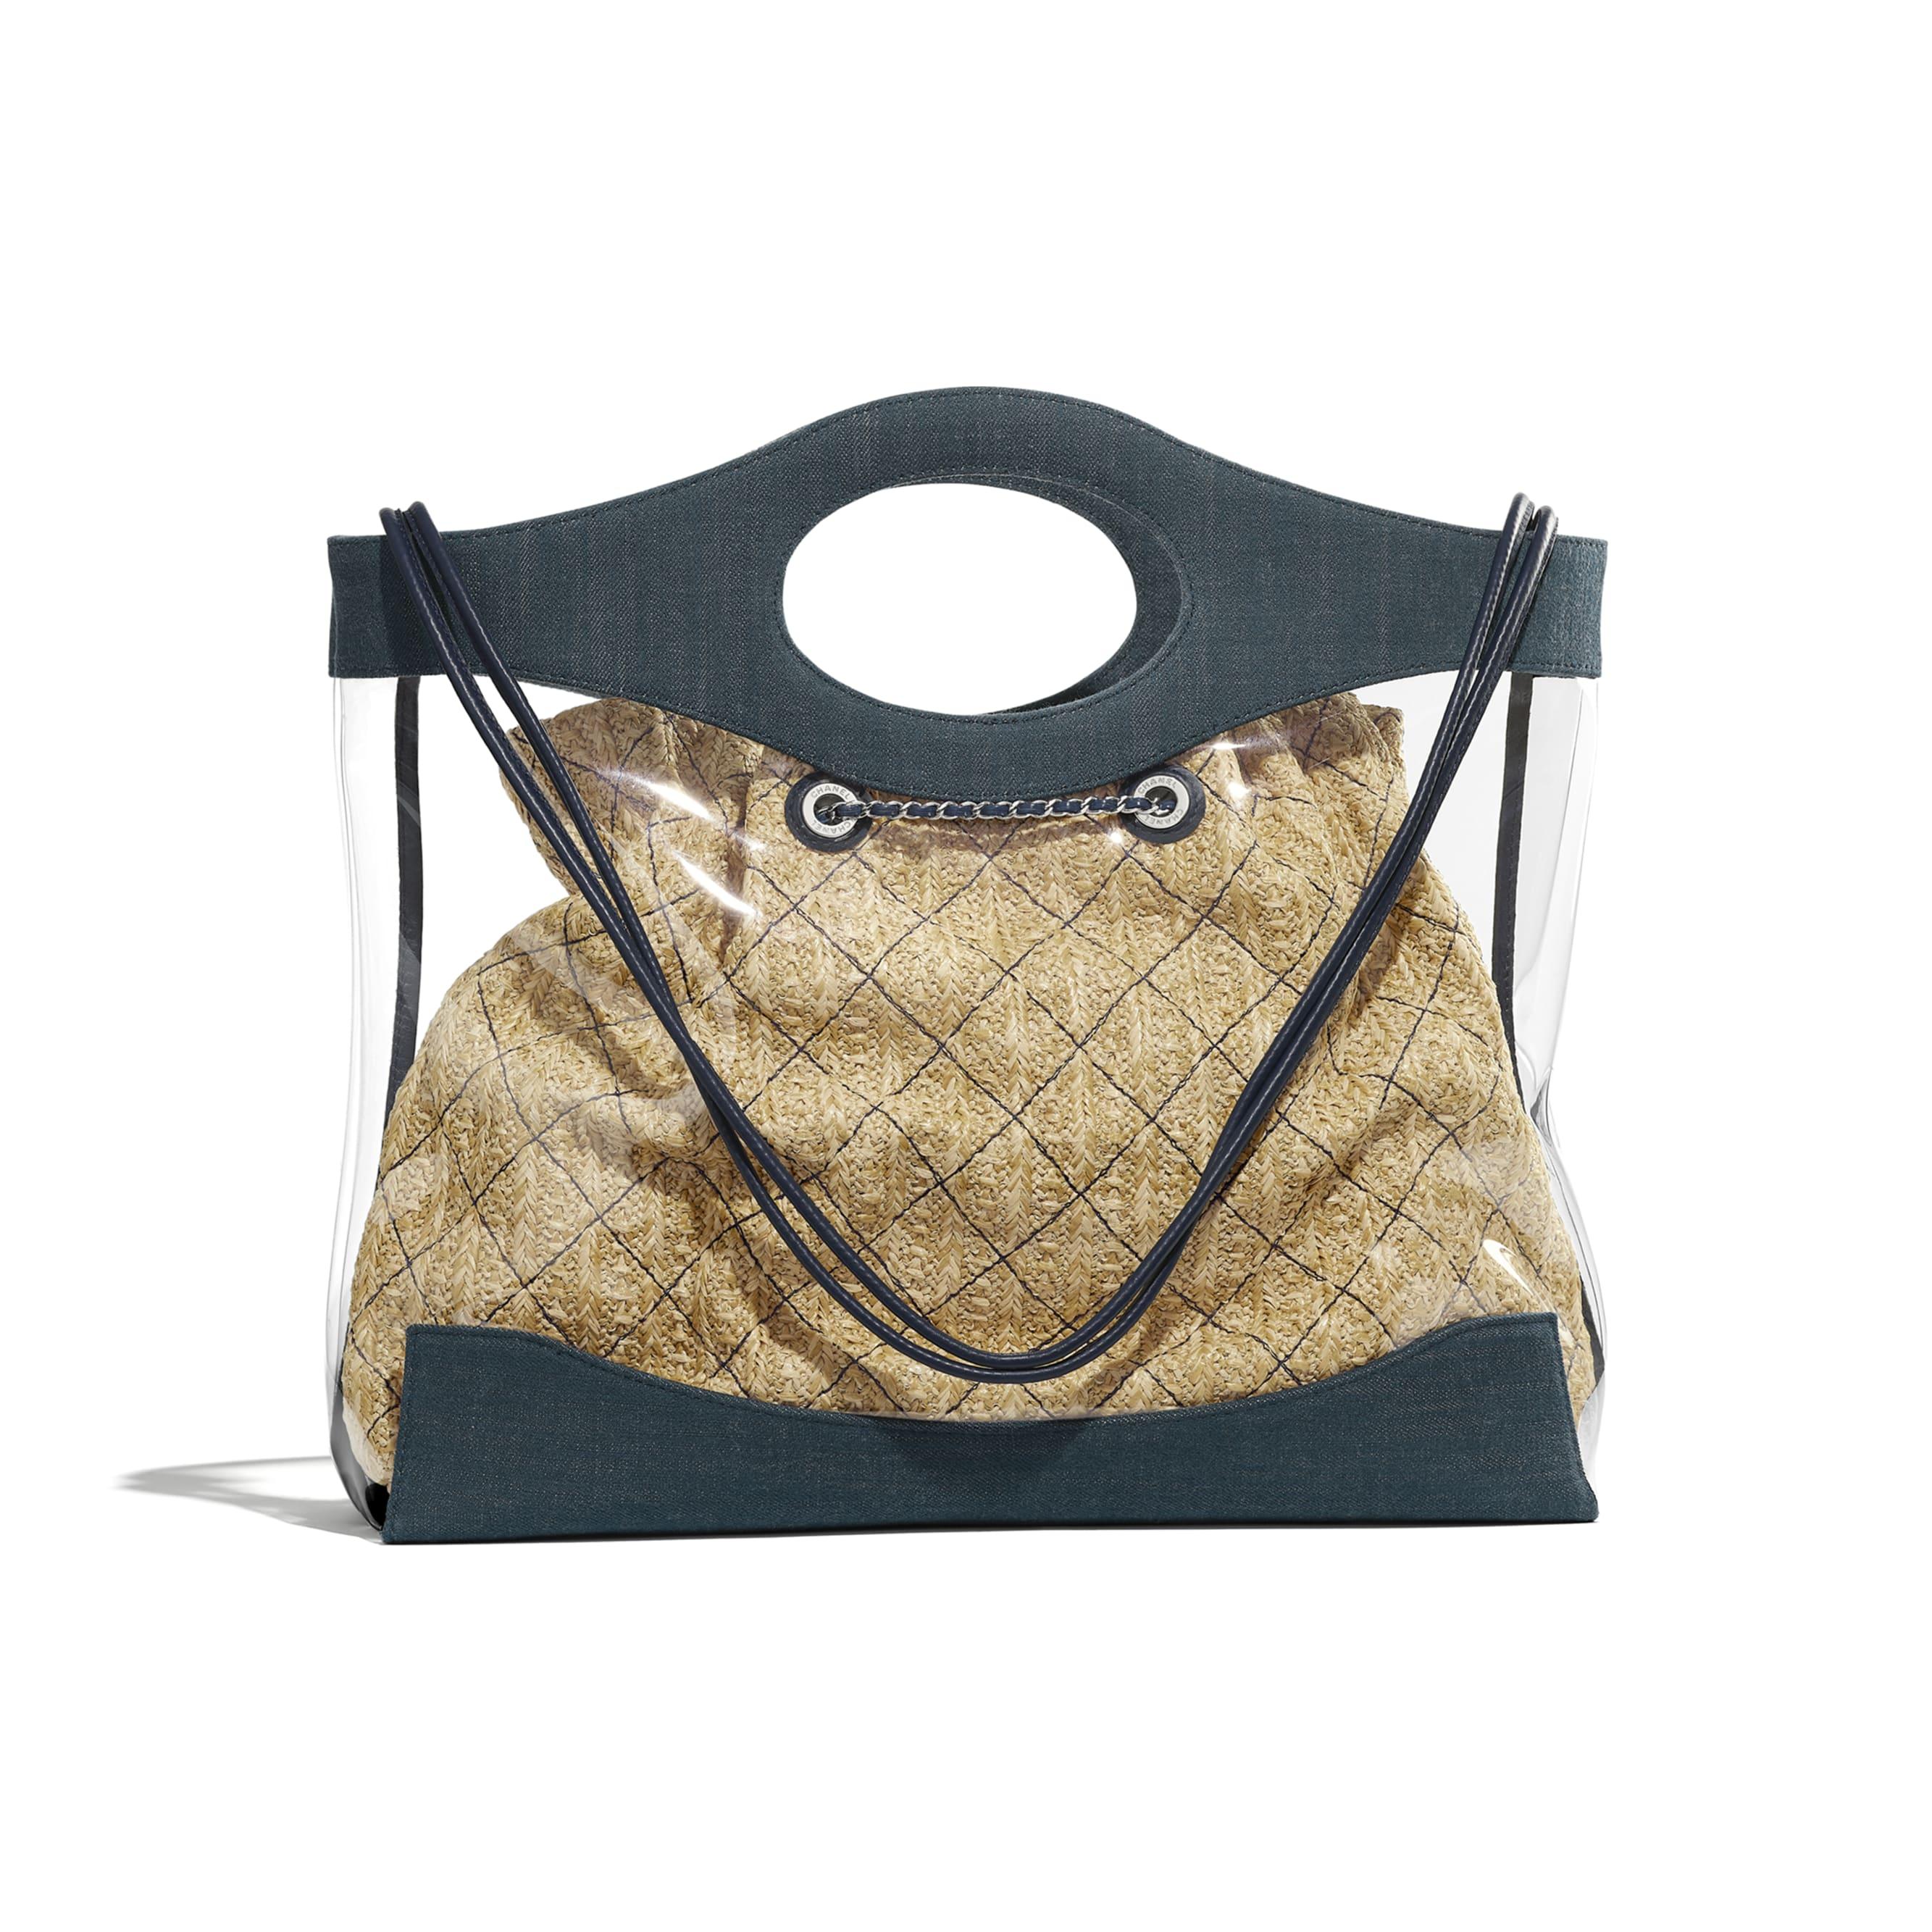 CHANEL 31 Shopping Bag - Blue - PVC, Denim, Calfskin & Silver-Tone Metal - Alternative view - see standard sized version